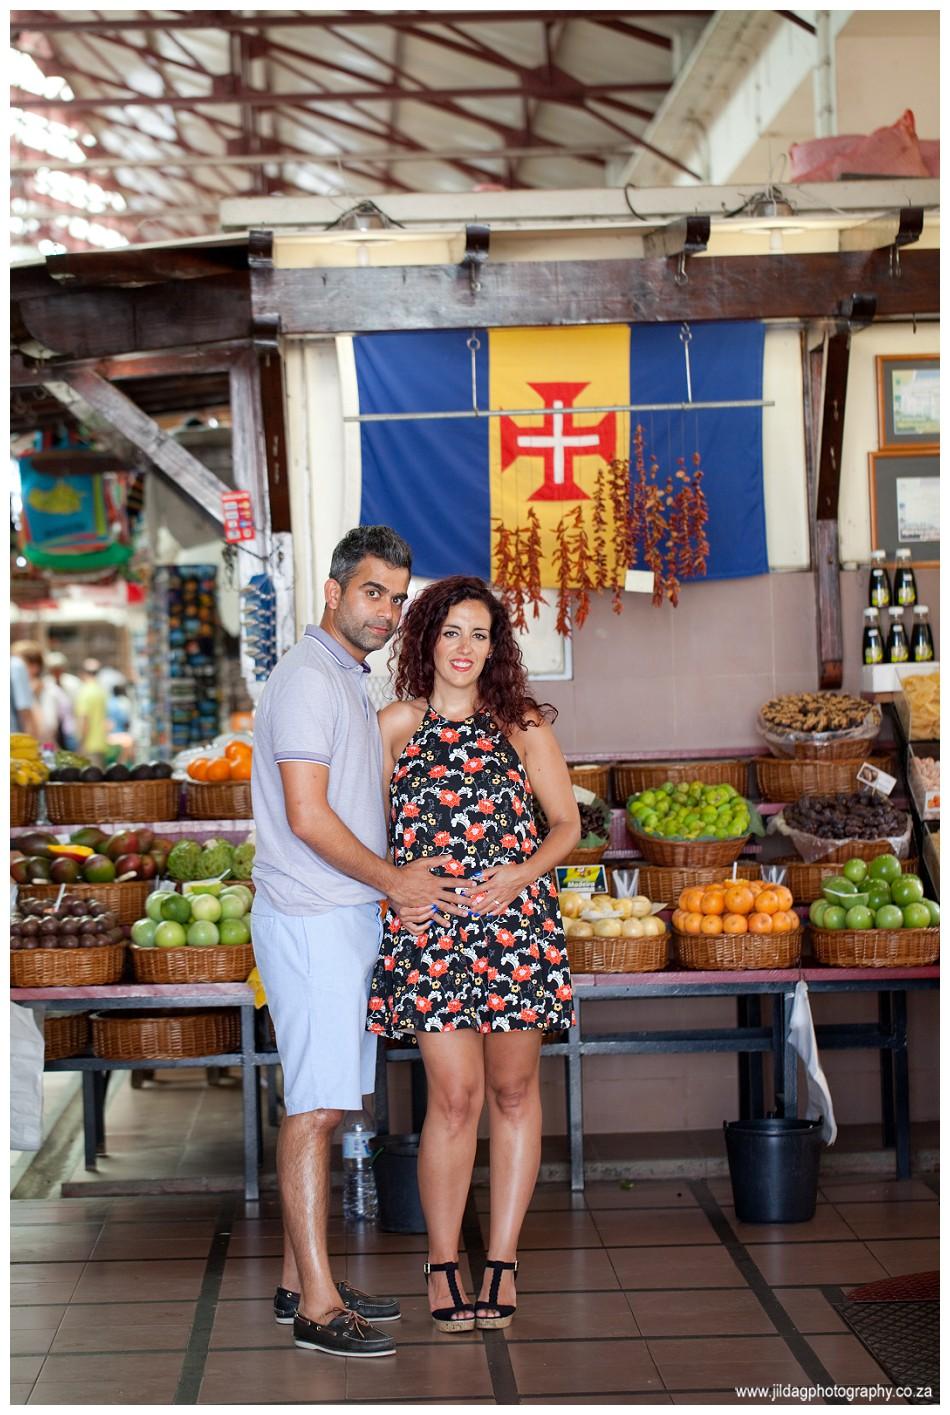 Destination-photographer-Jilda-G-photography-maternity-Madeira-photoshoot (12)